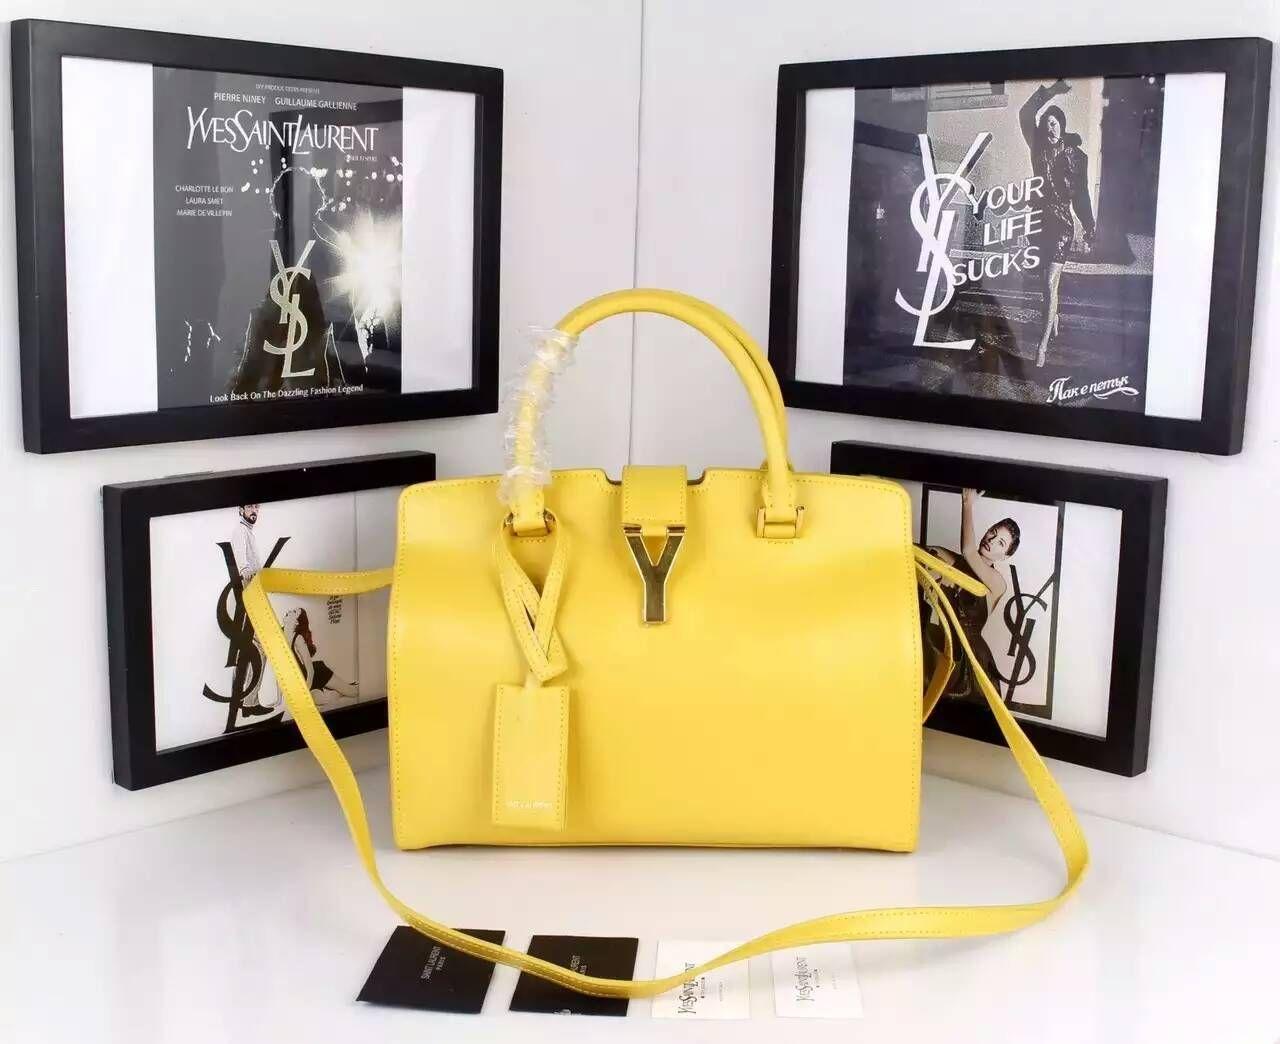 Yves Saint Laurent <YSL> handbags